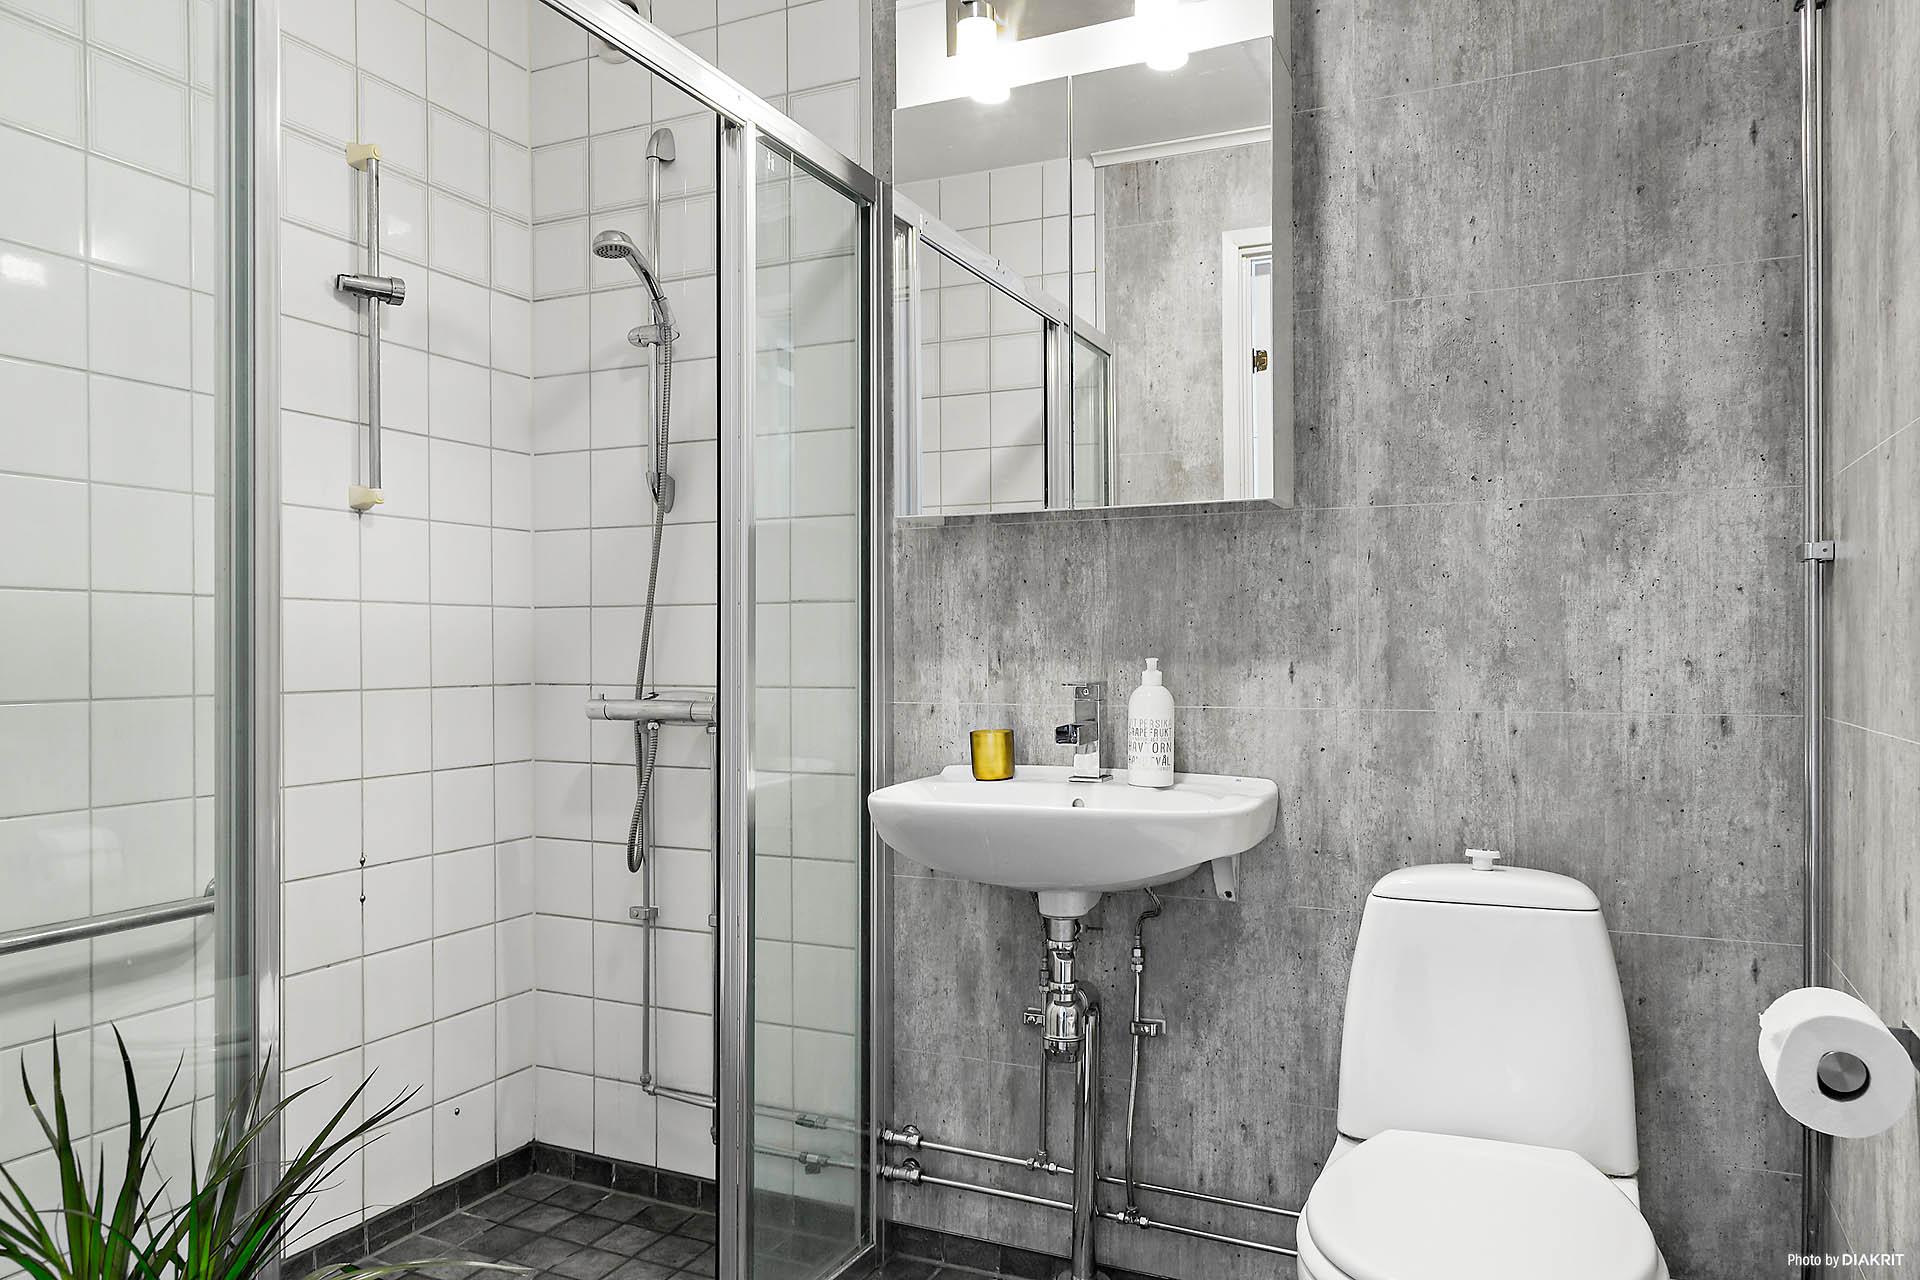 Helkaklat badrum, delvis renoverat